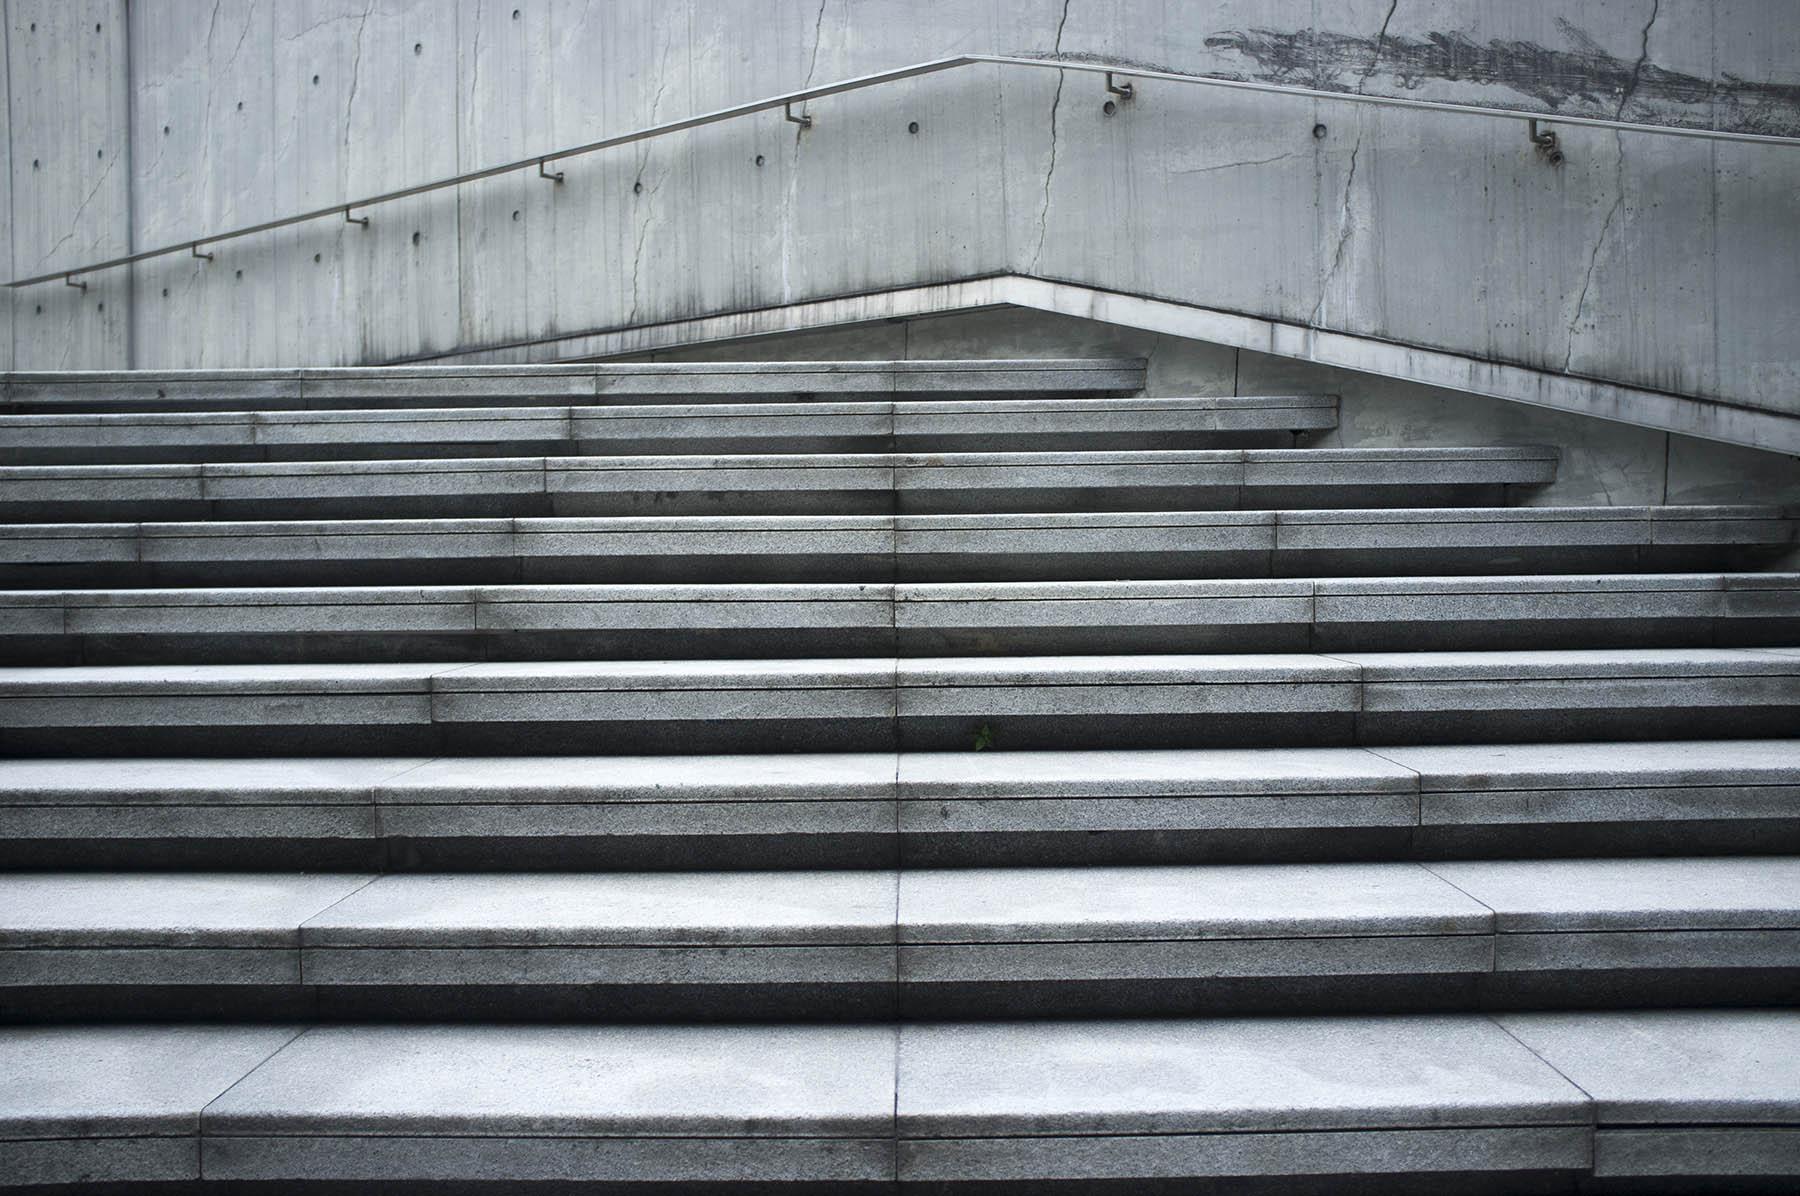 Guangzhou opera house staircase.